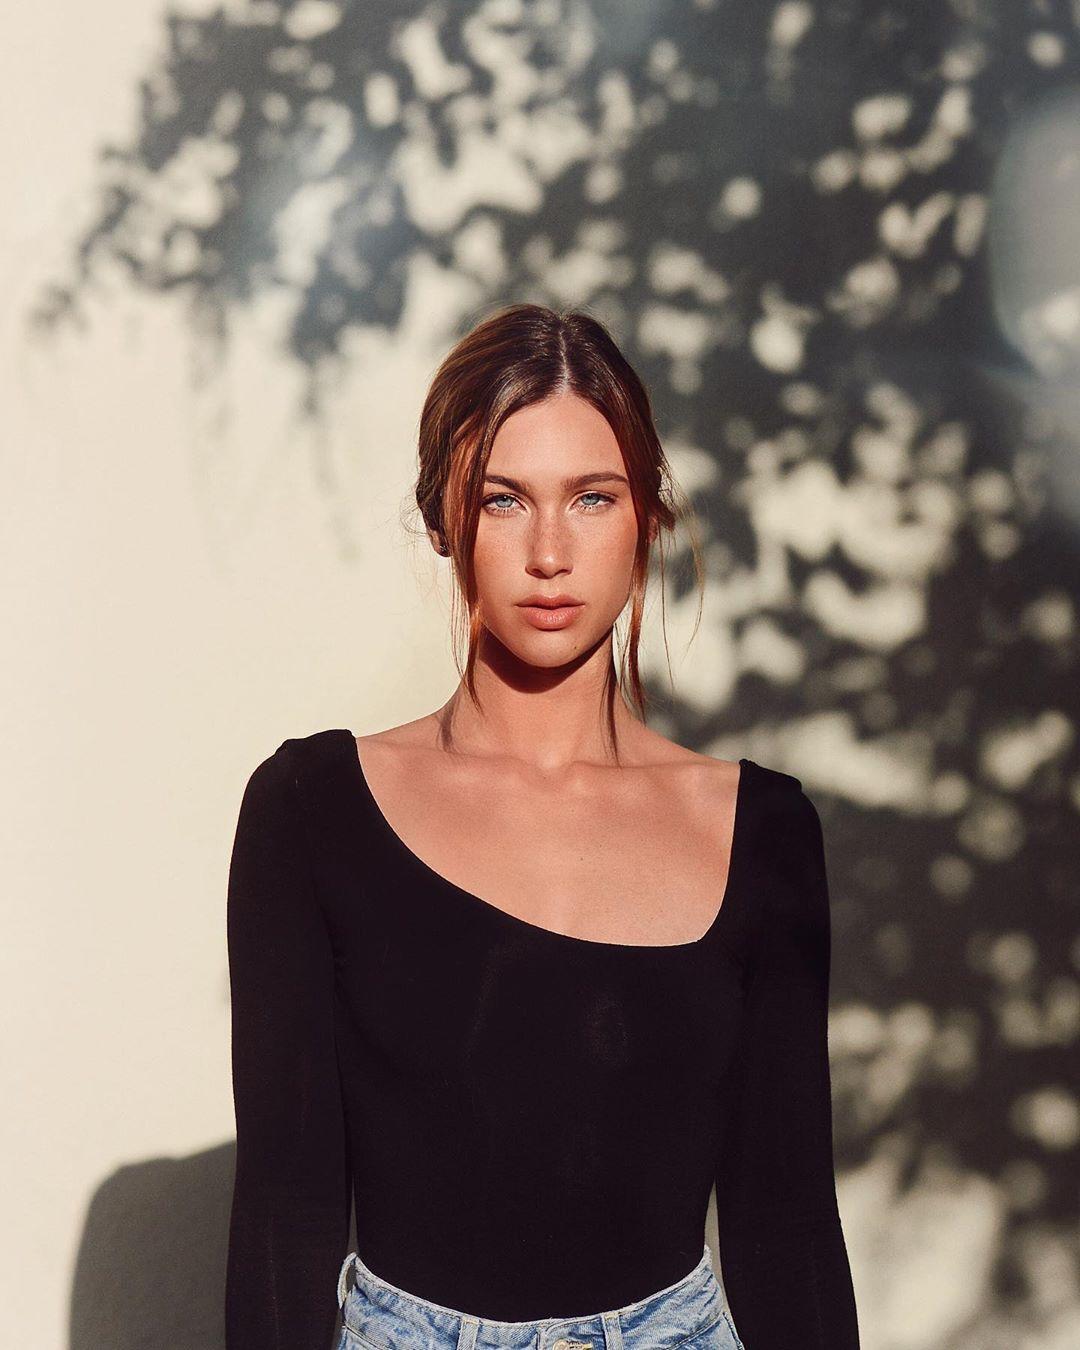 Maggie-Keating-Wallpapers-Insta-Fit-Bio-4